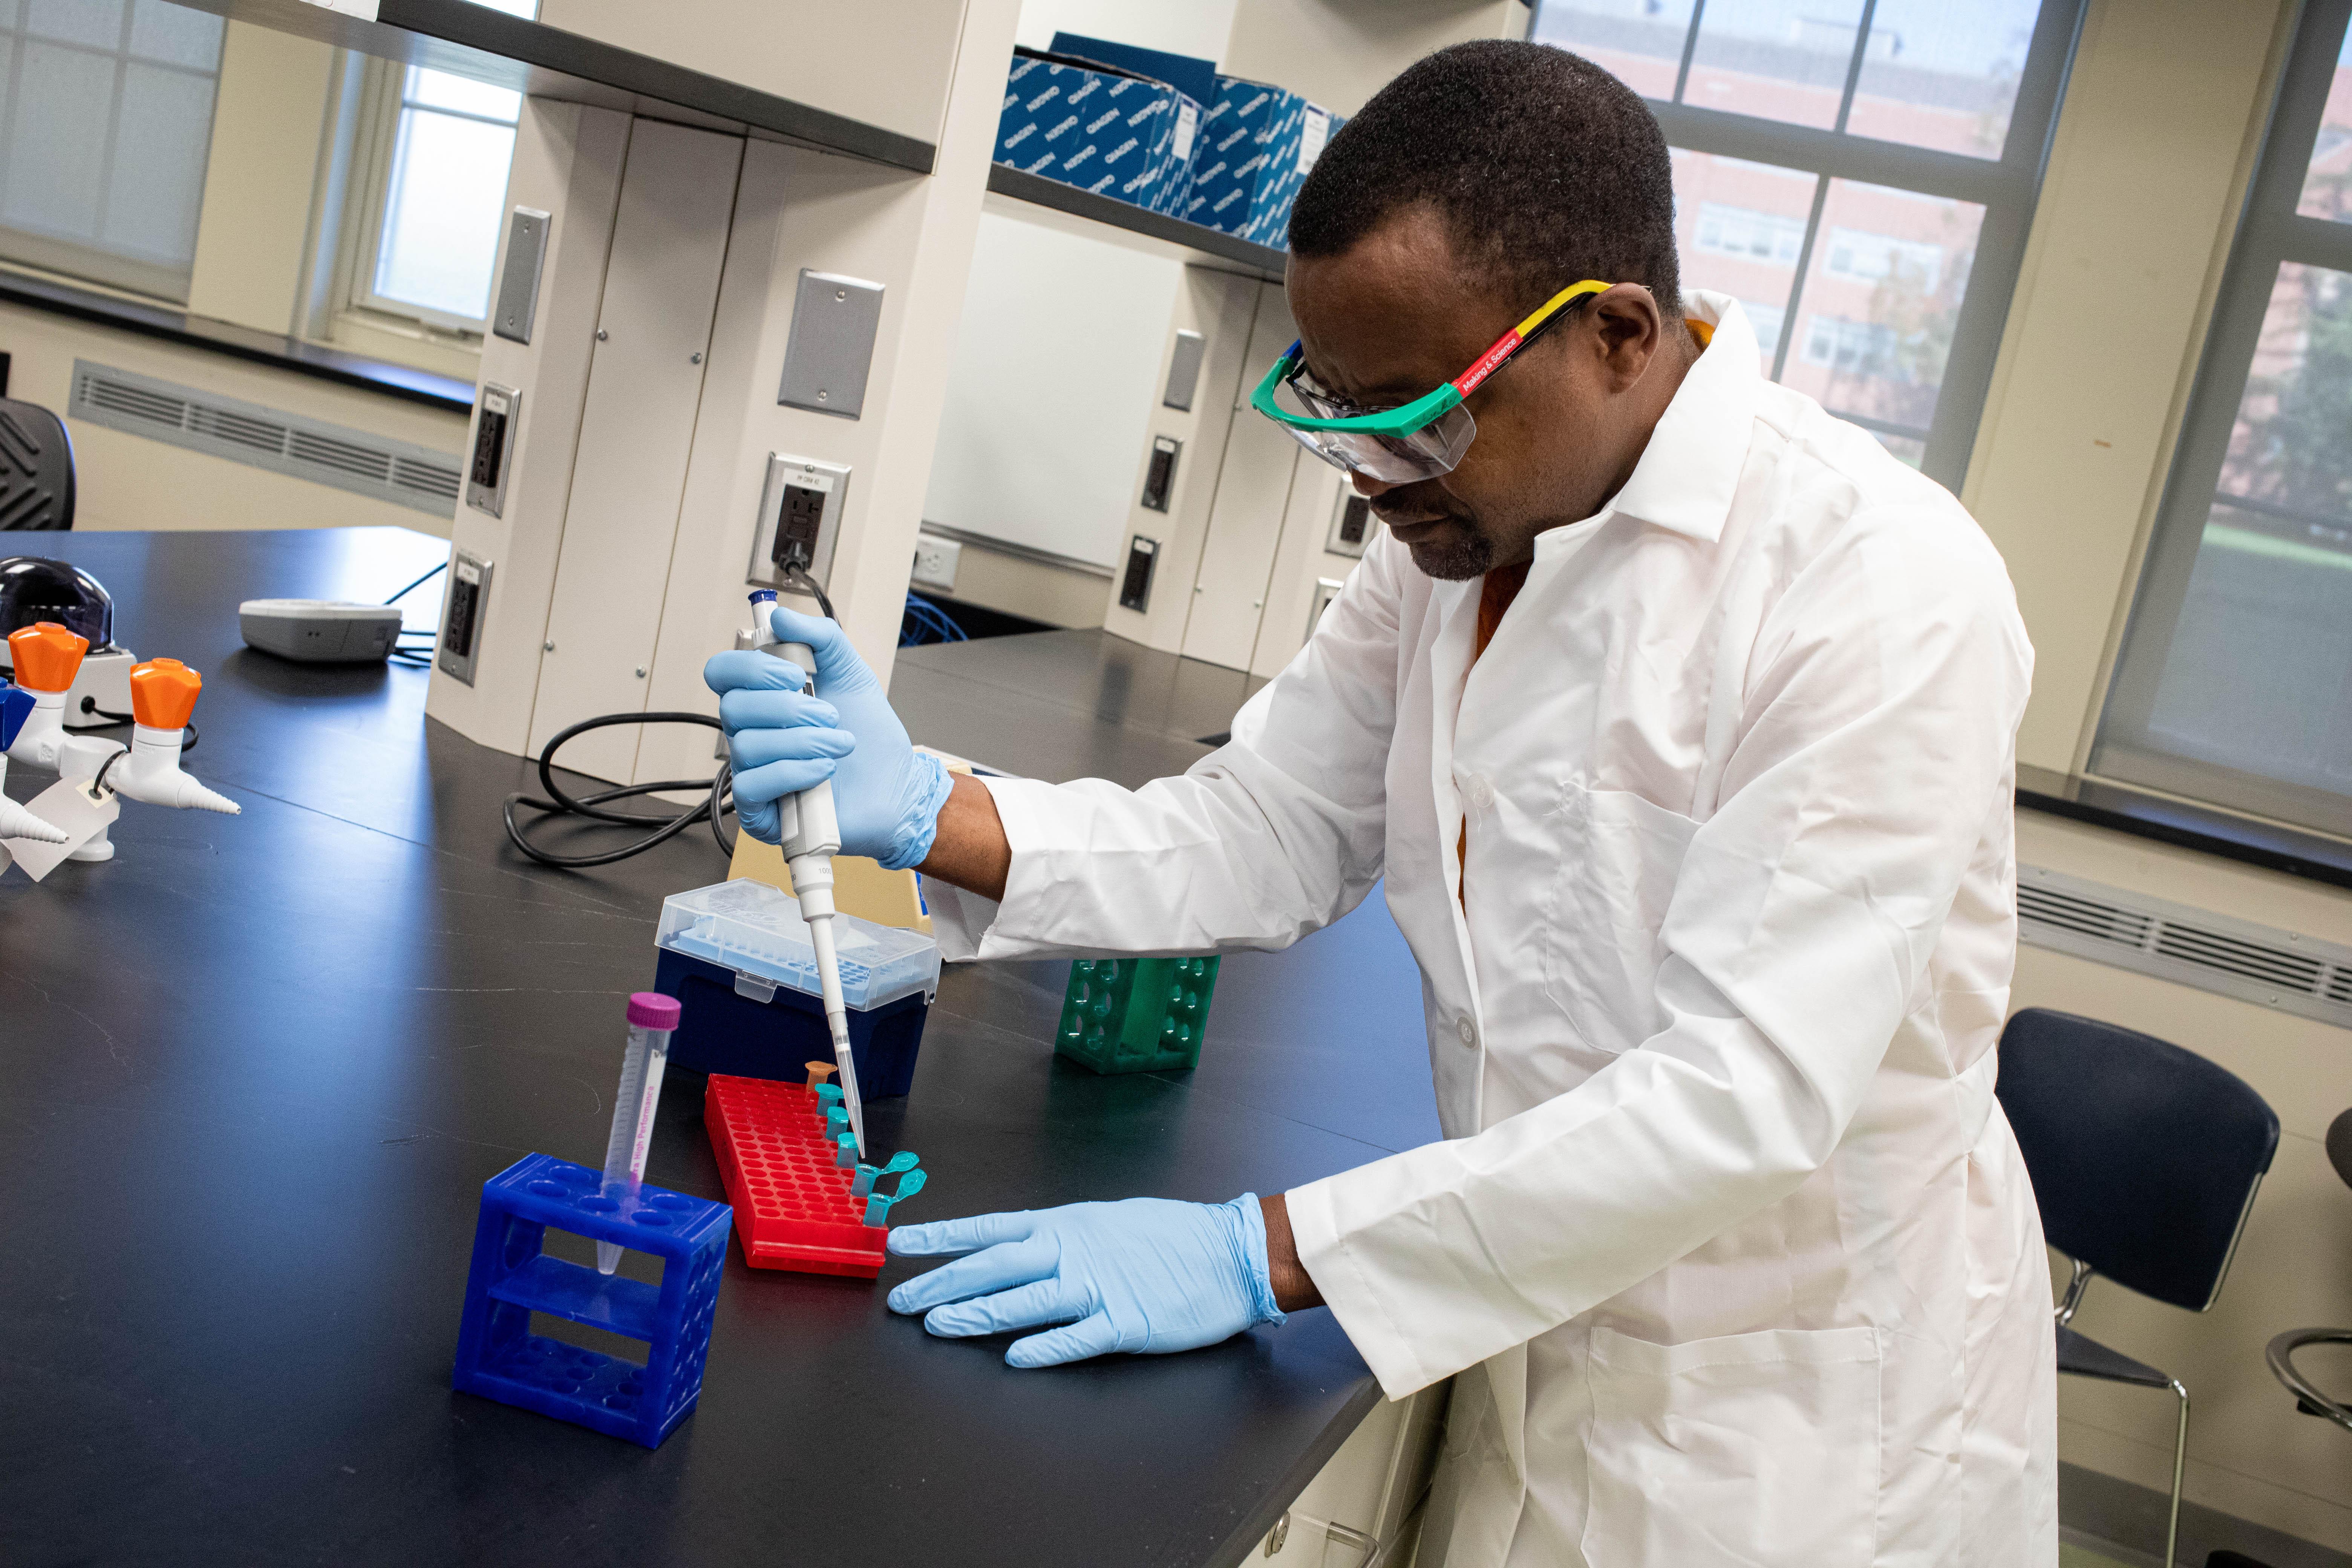 Man in lab coat performs lab work.